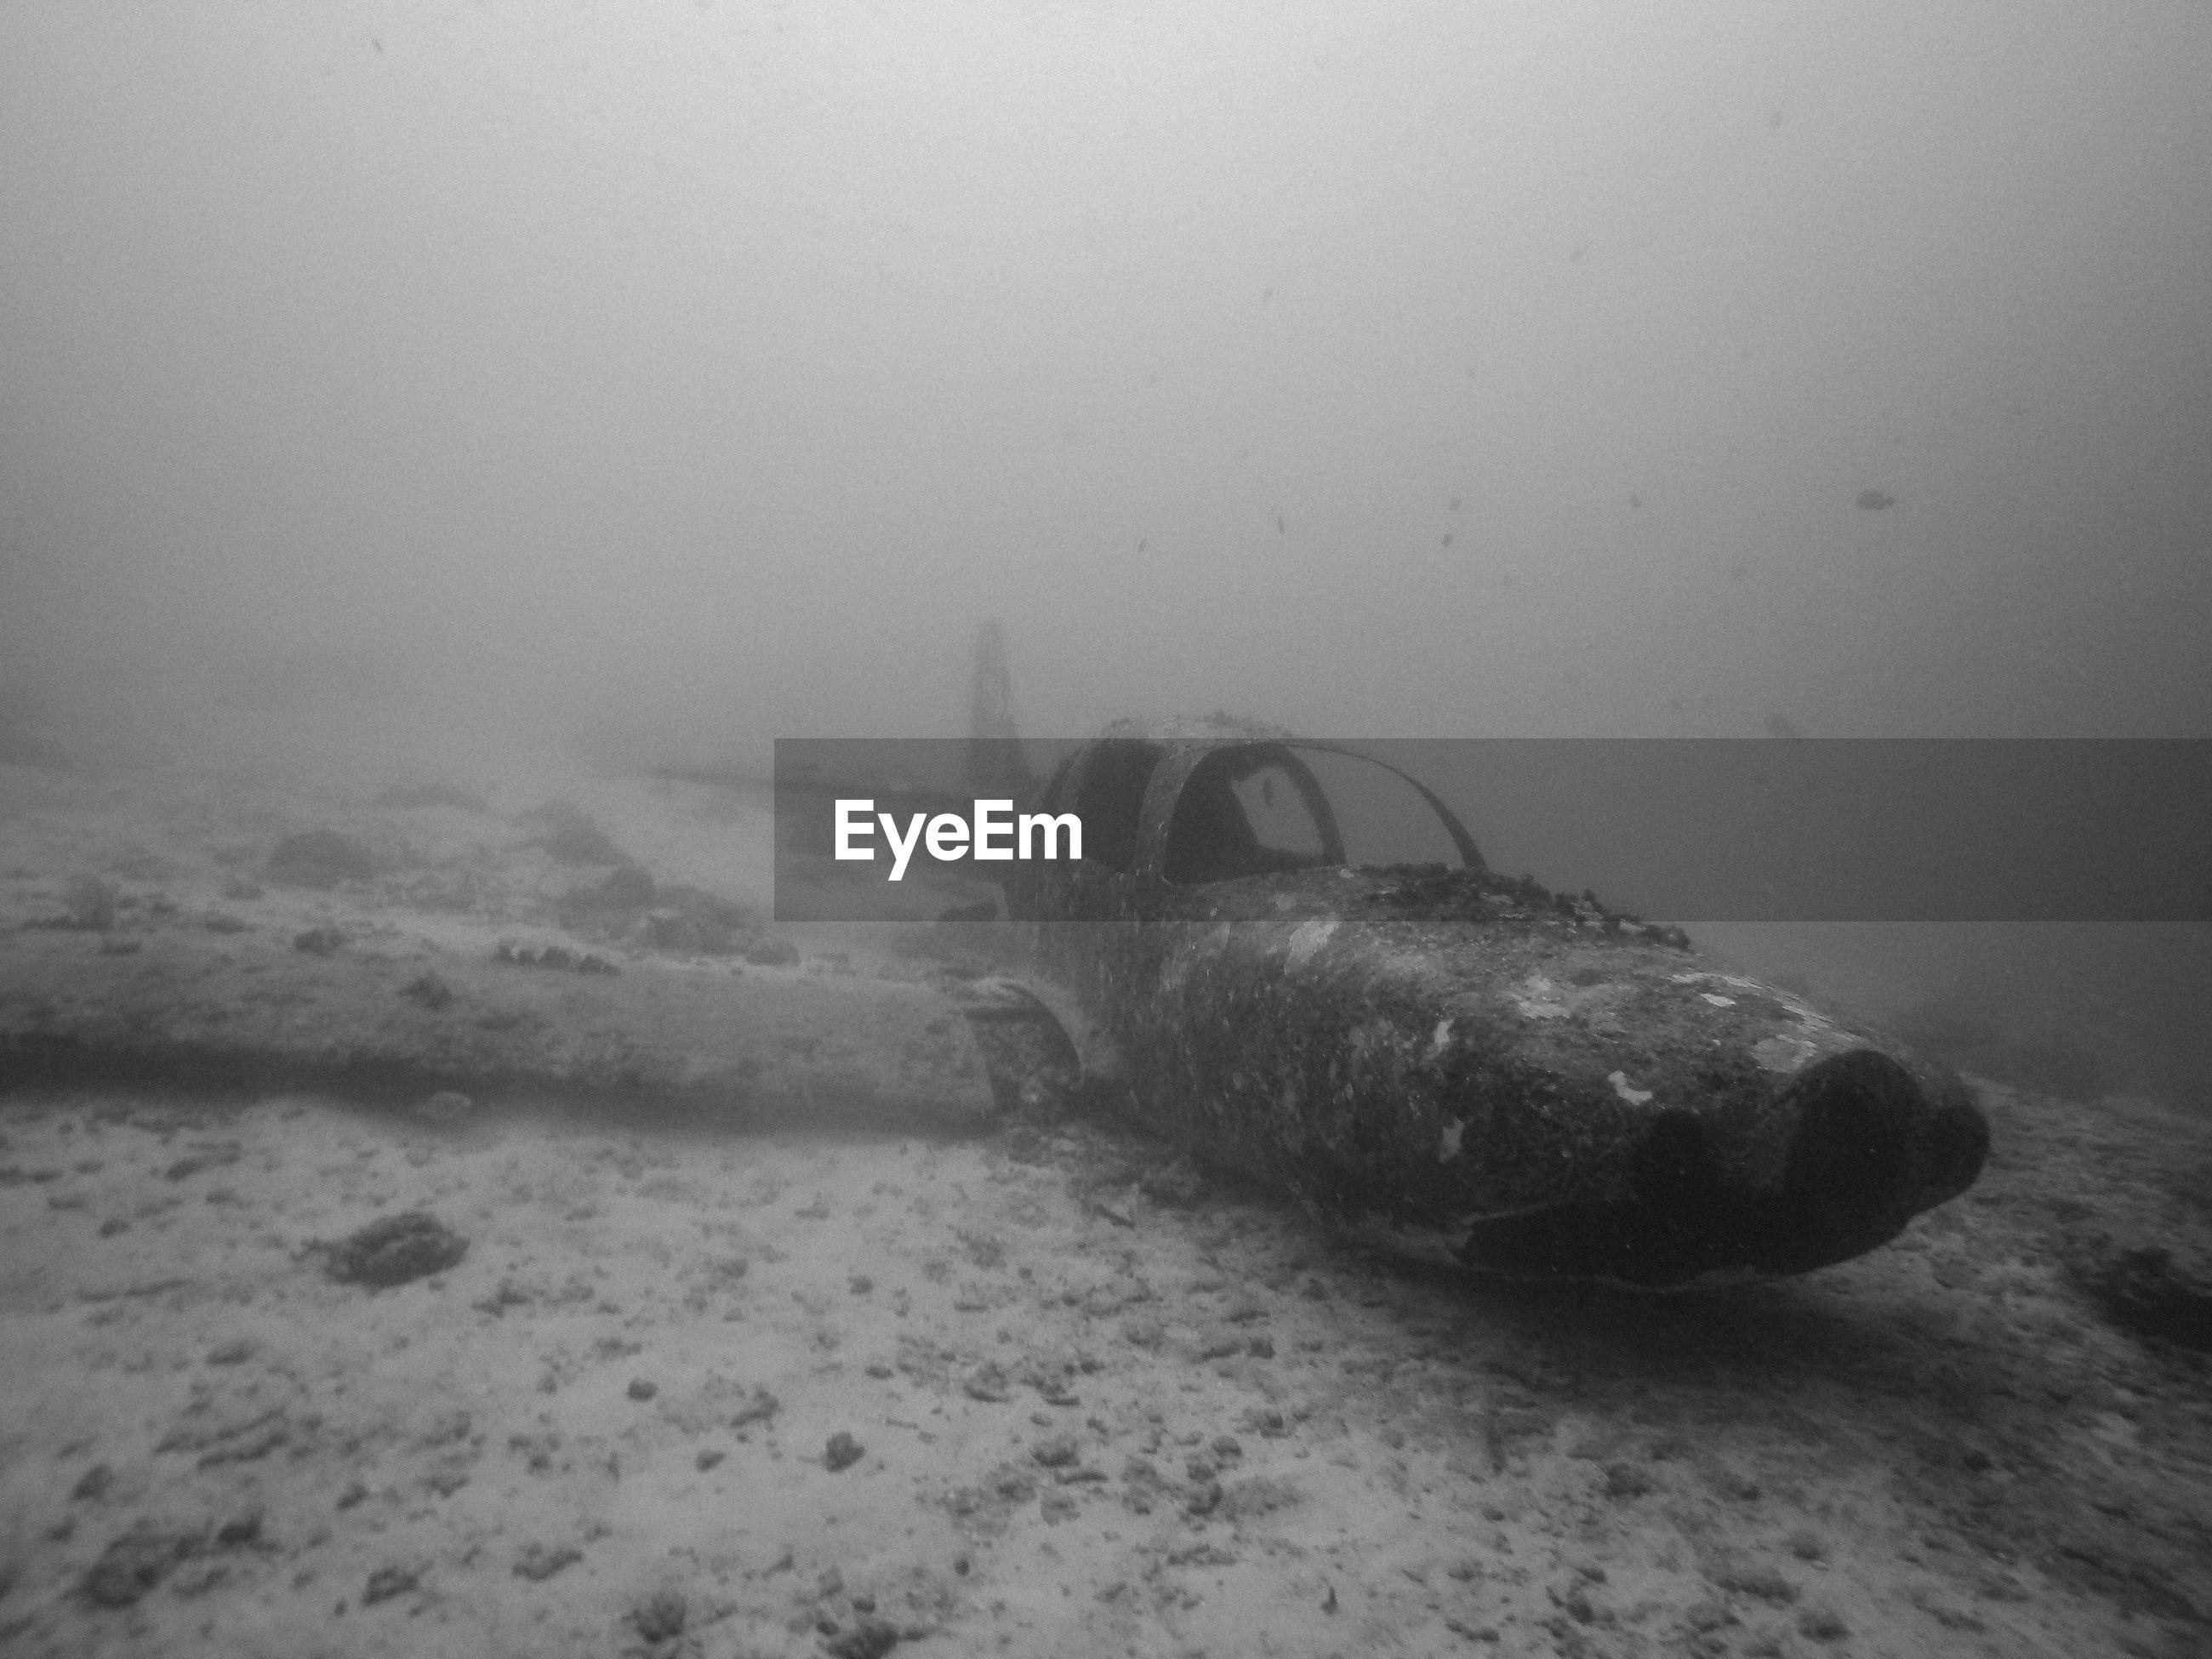 Abandoned airplane undersea